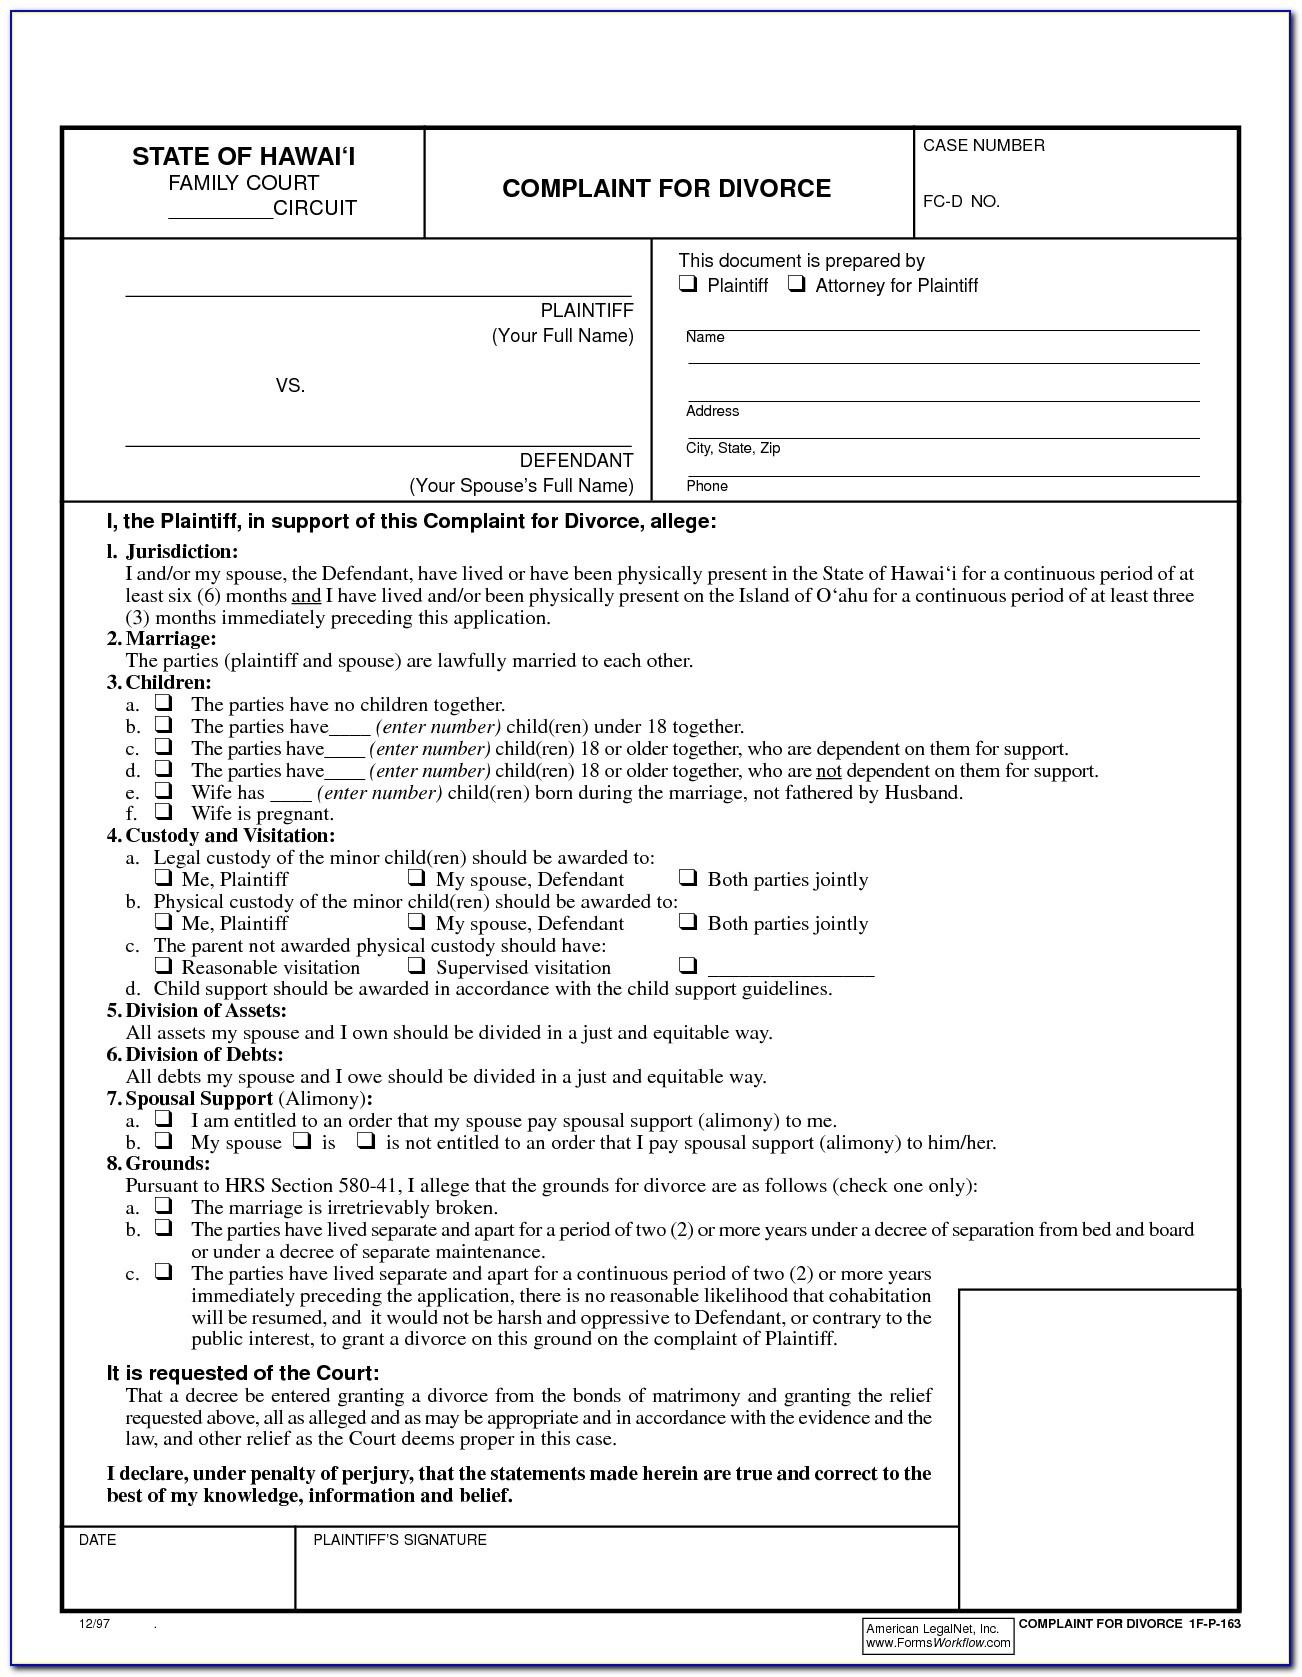 Free Printable Divorce Forms Texas - Form : Resume Examples #xwmwaoklea - Free Printable Divorce Forms Texas